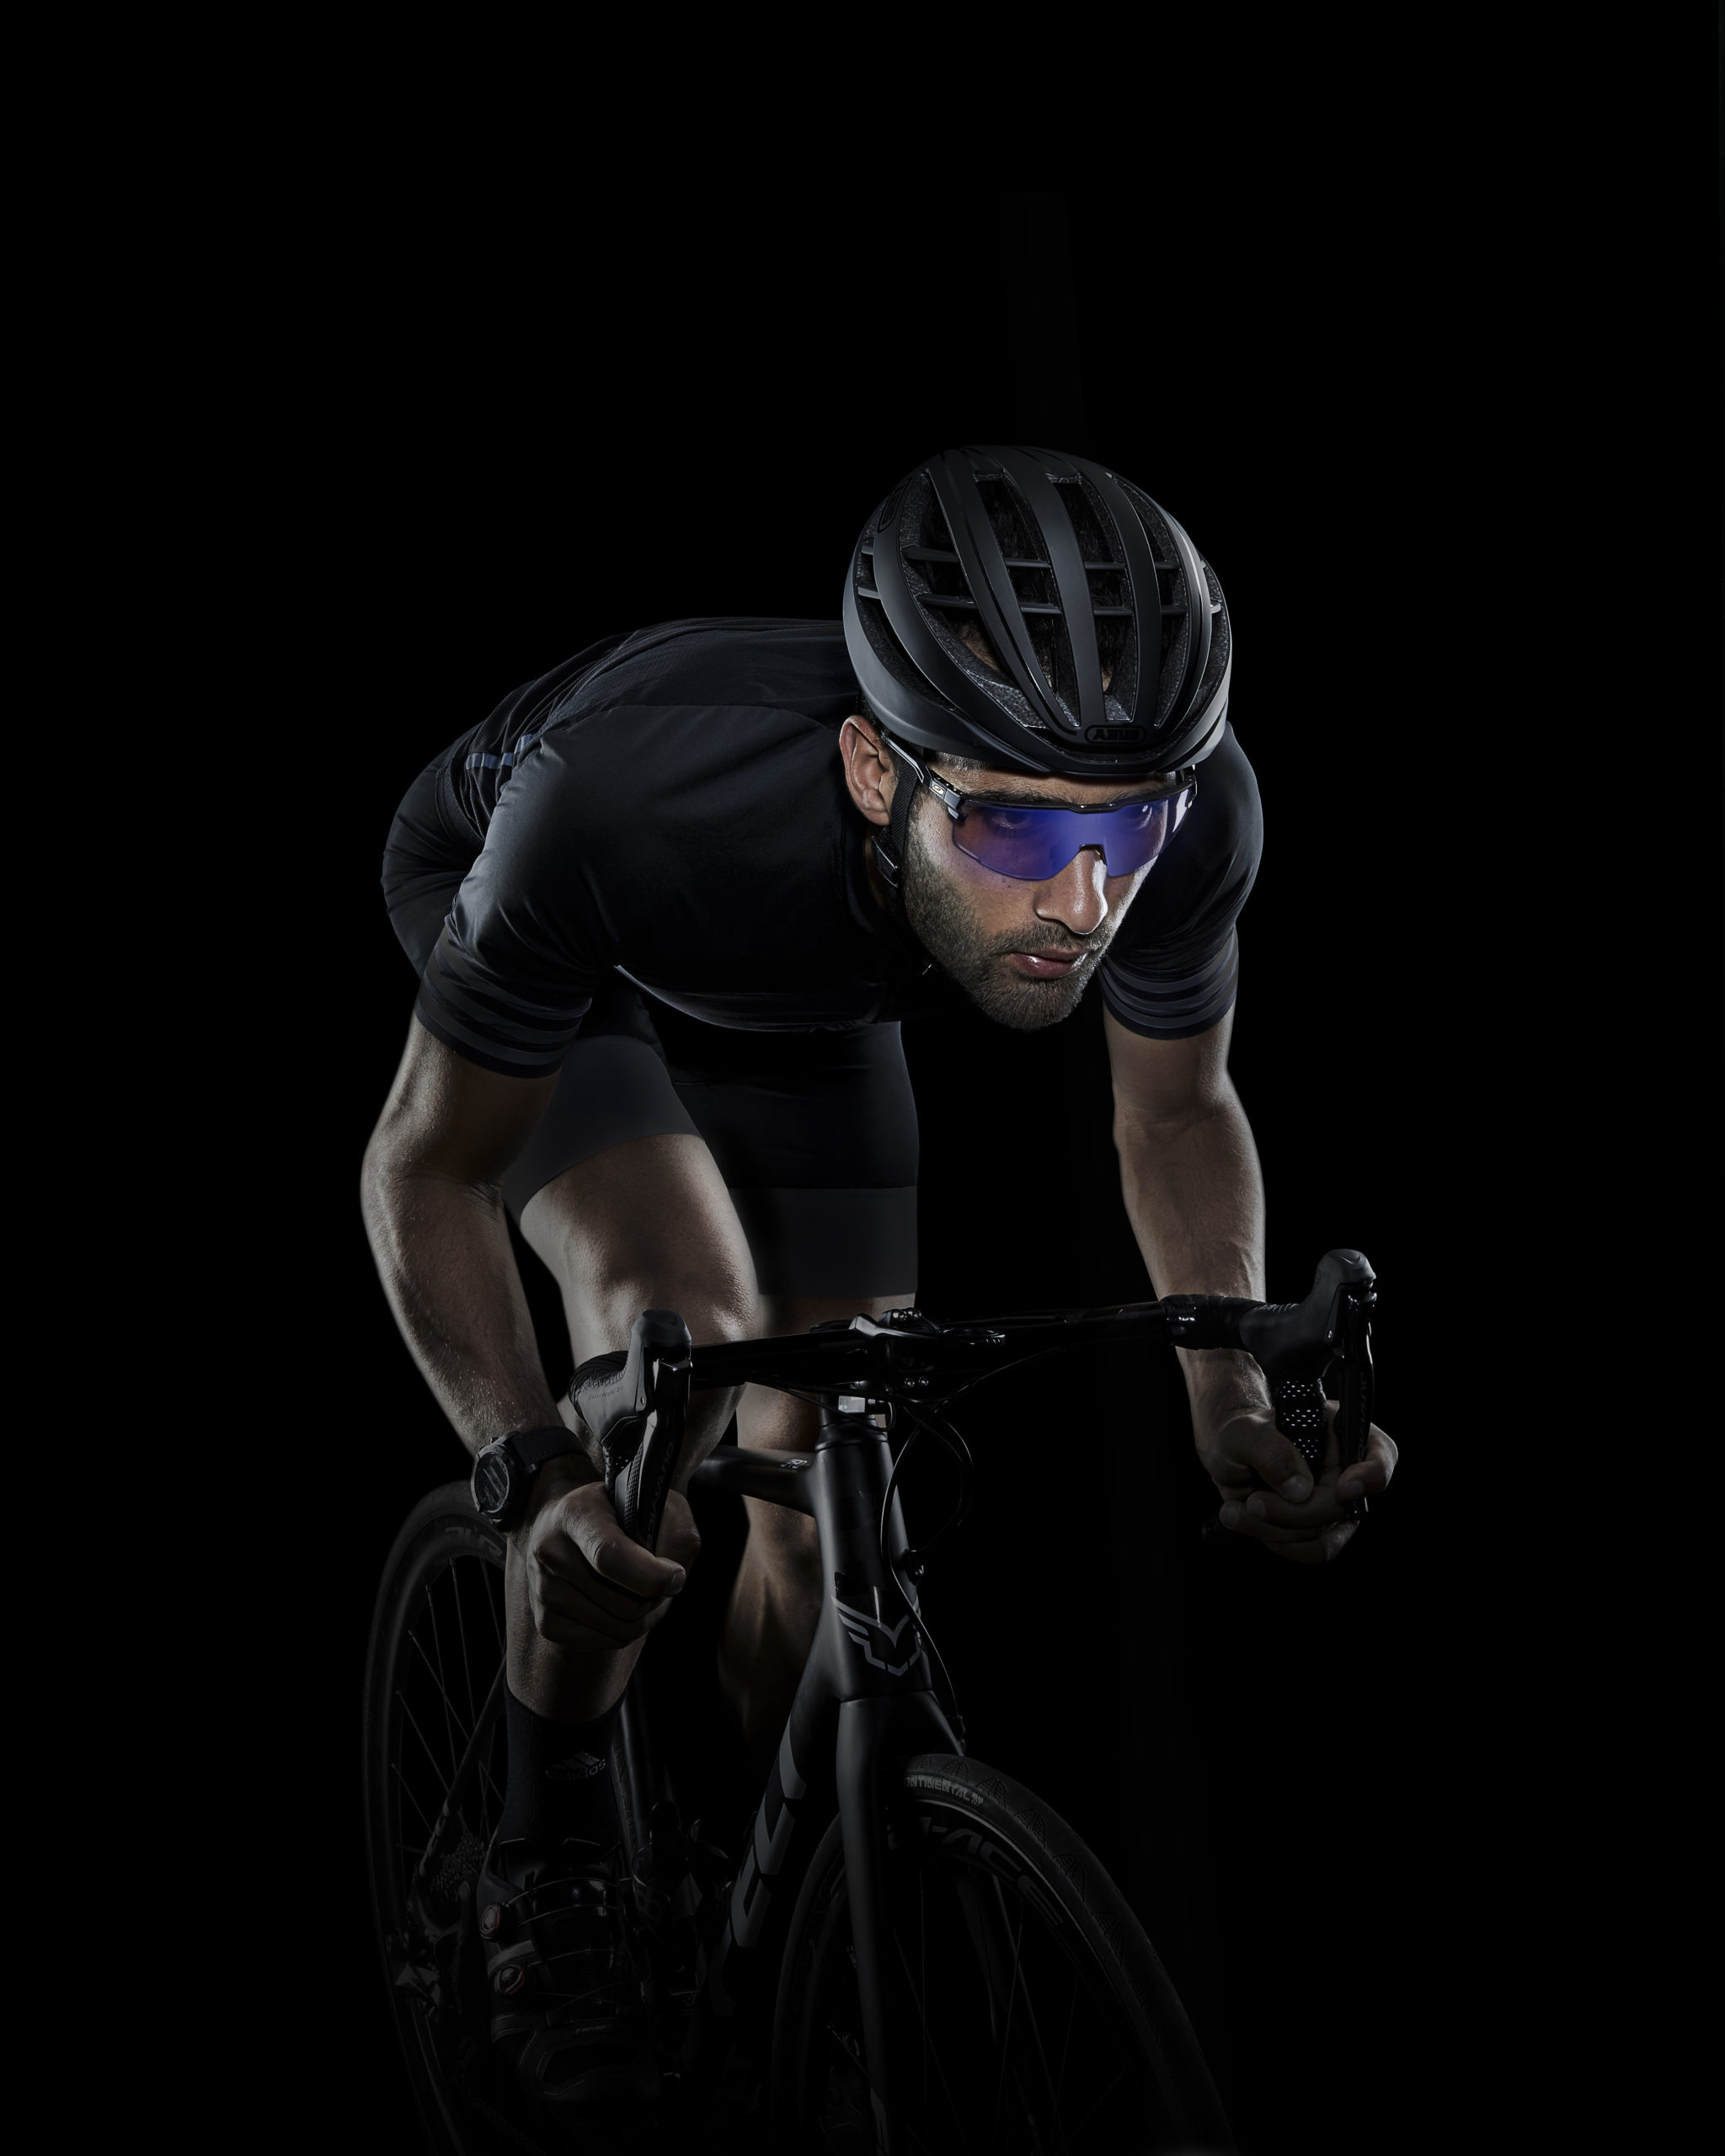 Martin_Fourcade_Studio_Bike_Ultimate_CarbonMF_J5463414Ultimate-Carbon_Martin-Fourcade_Studio©Sémaphore